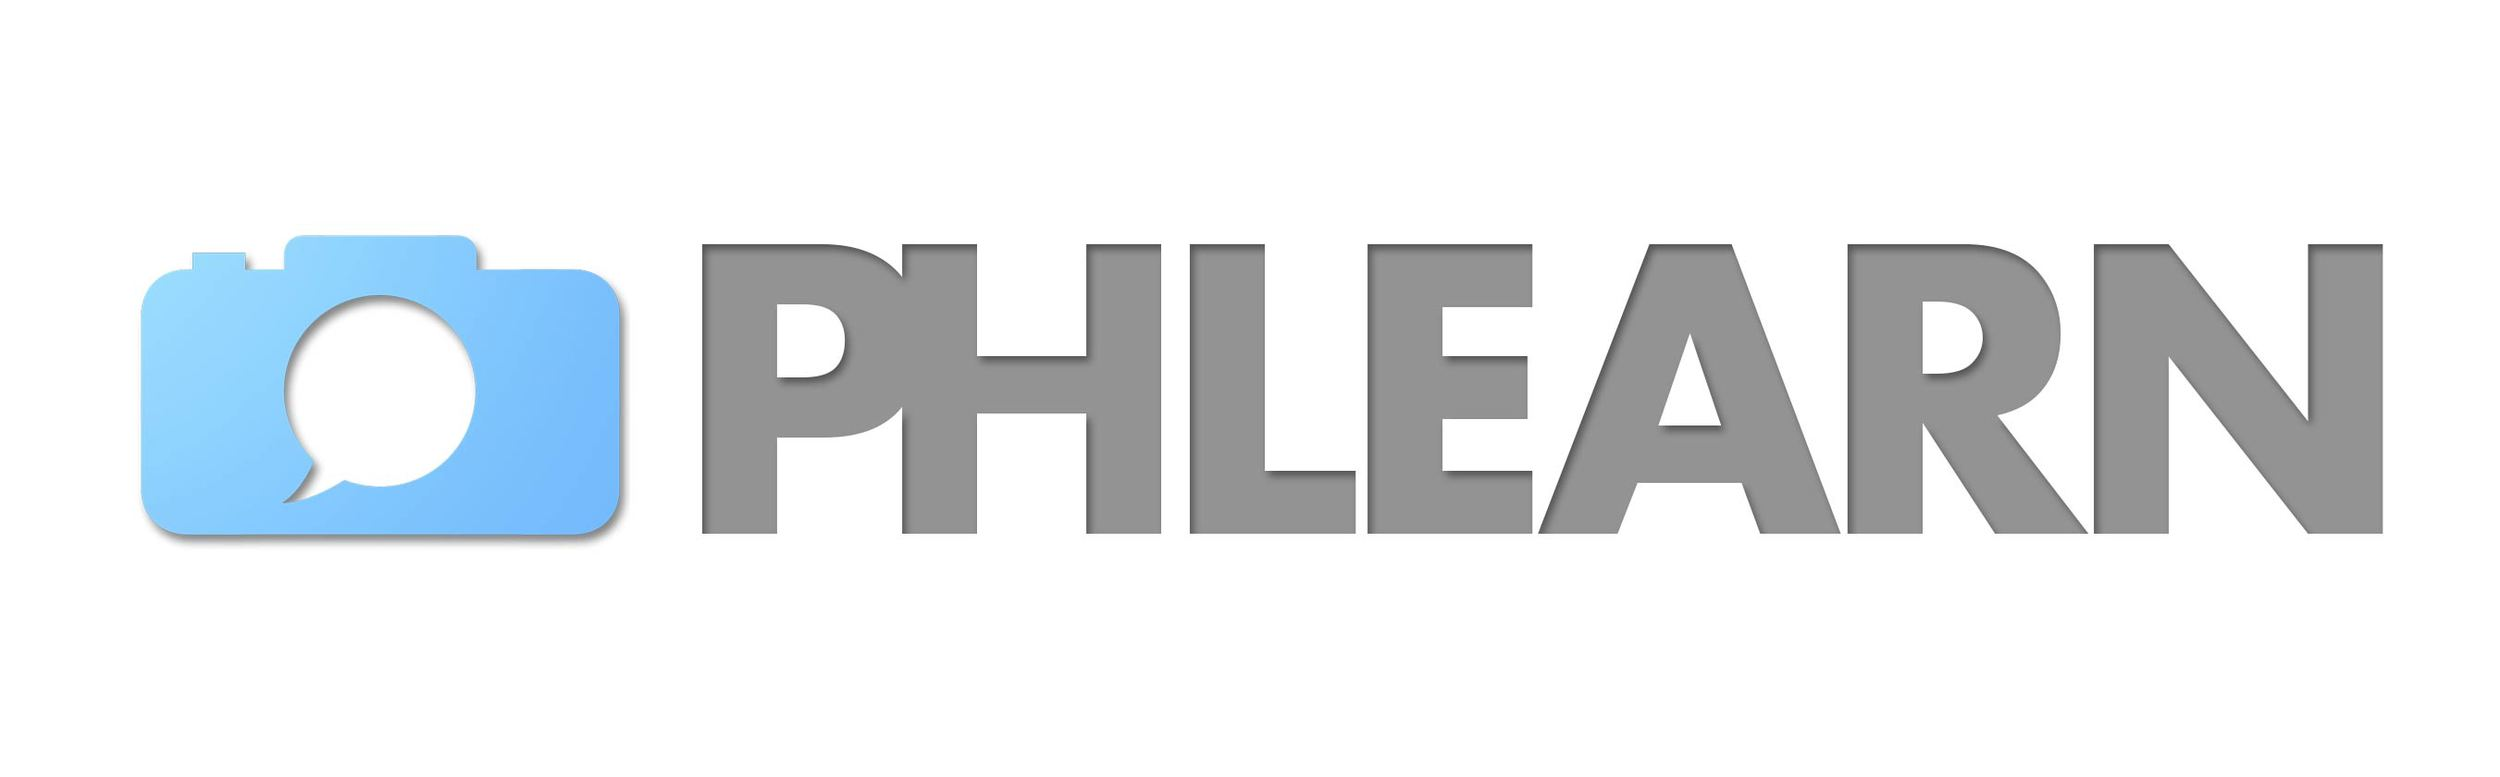 Phlearn-Logo-Large.jpg